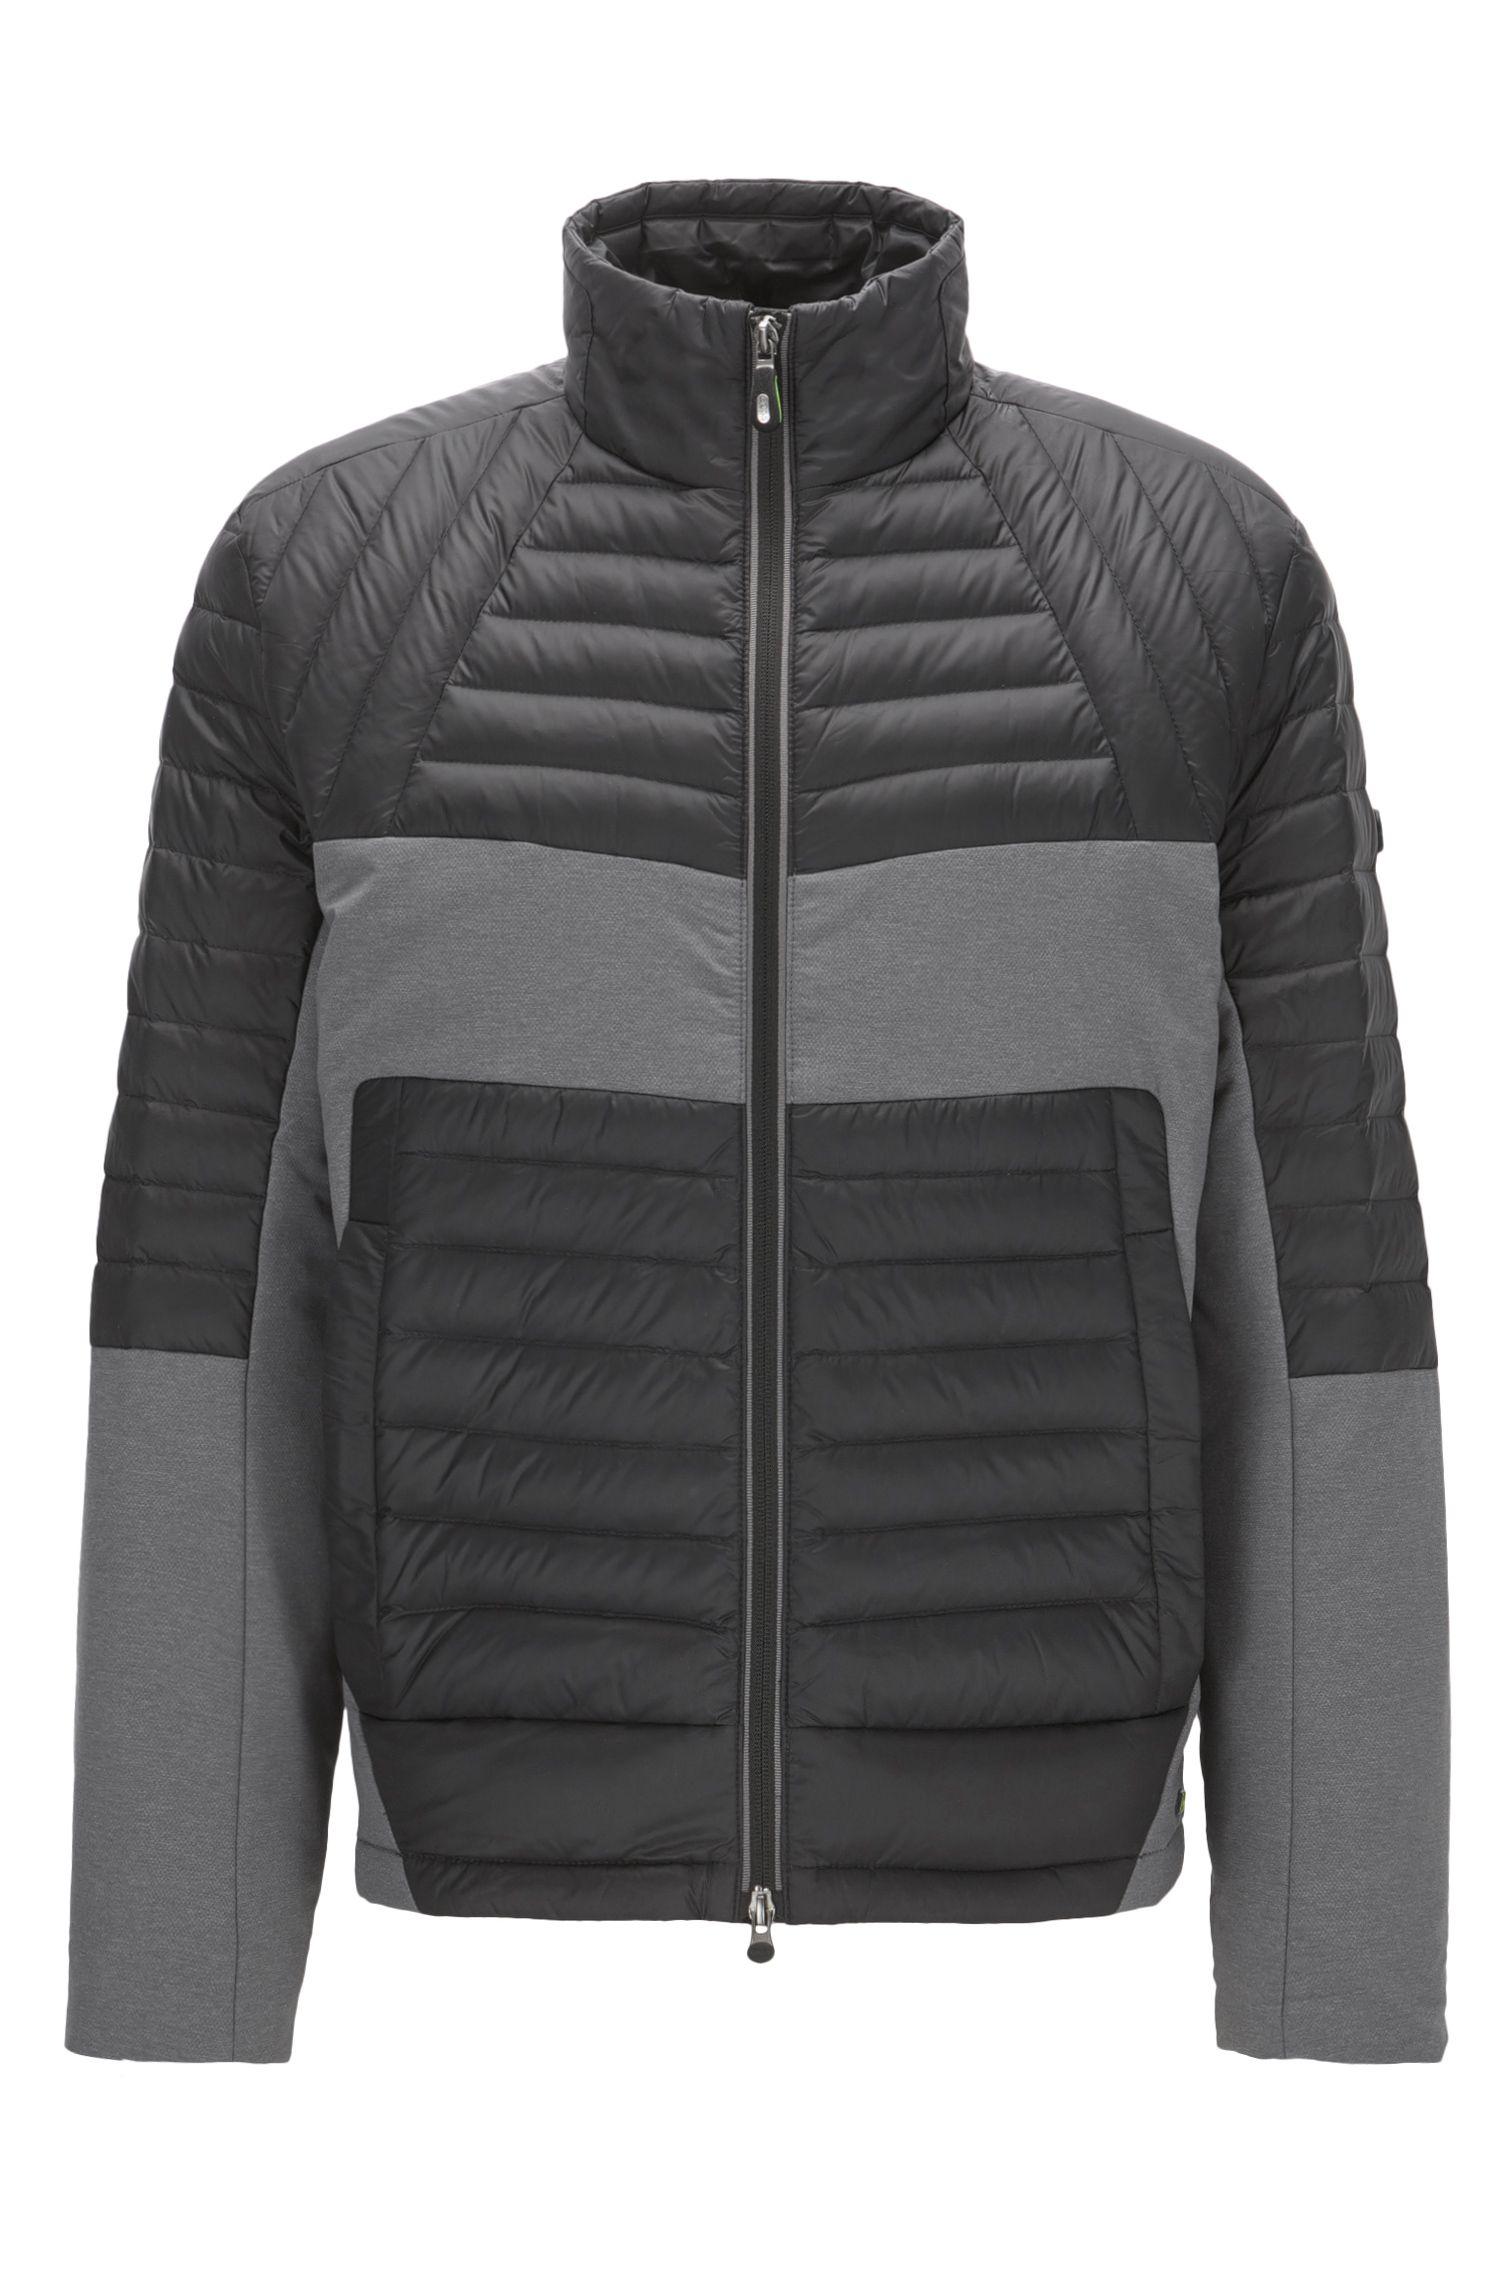 Regular-fit jacket in water-resistant fabric